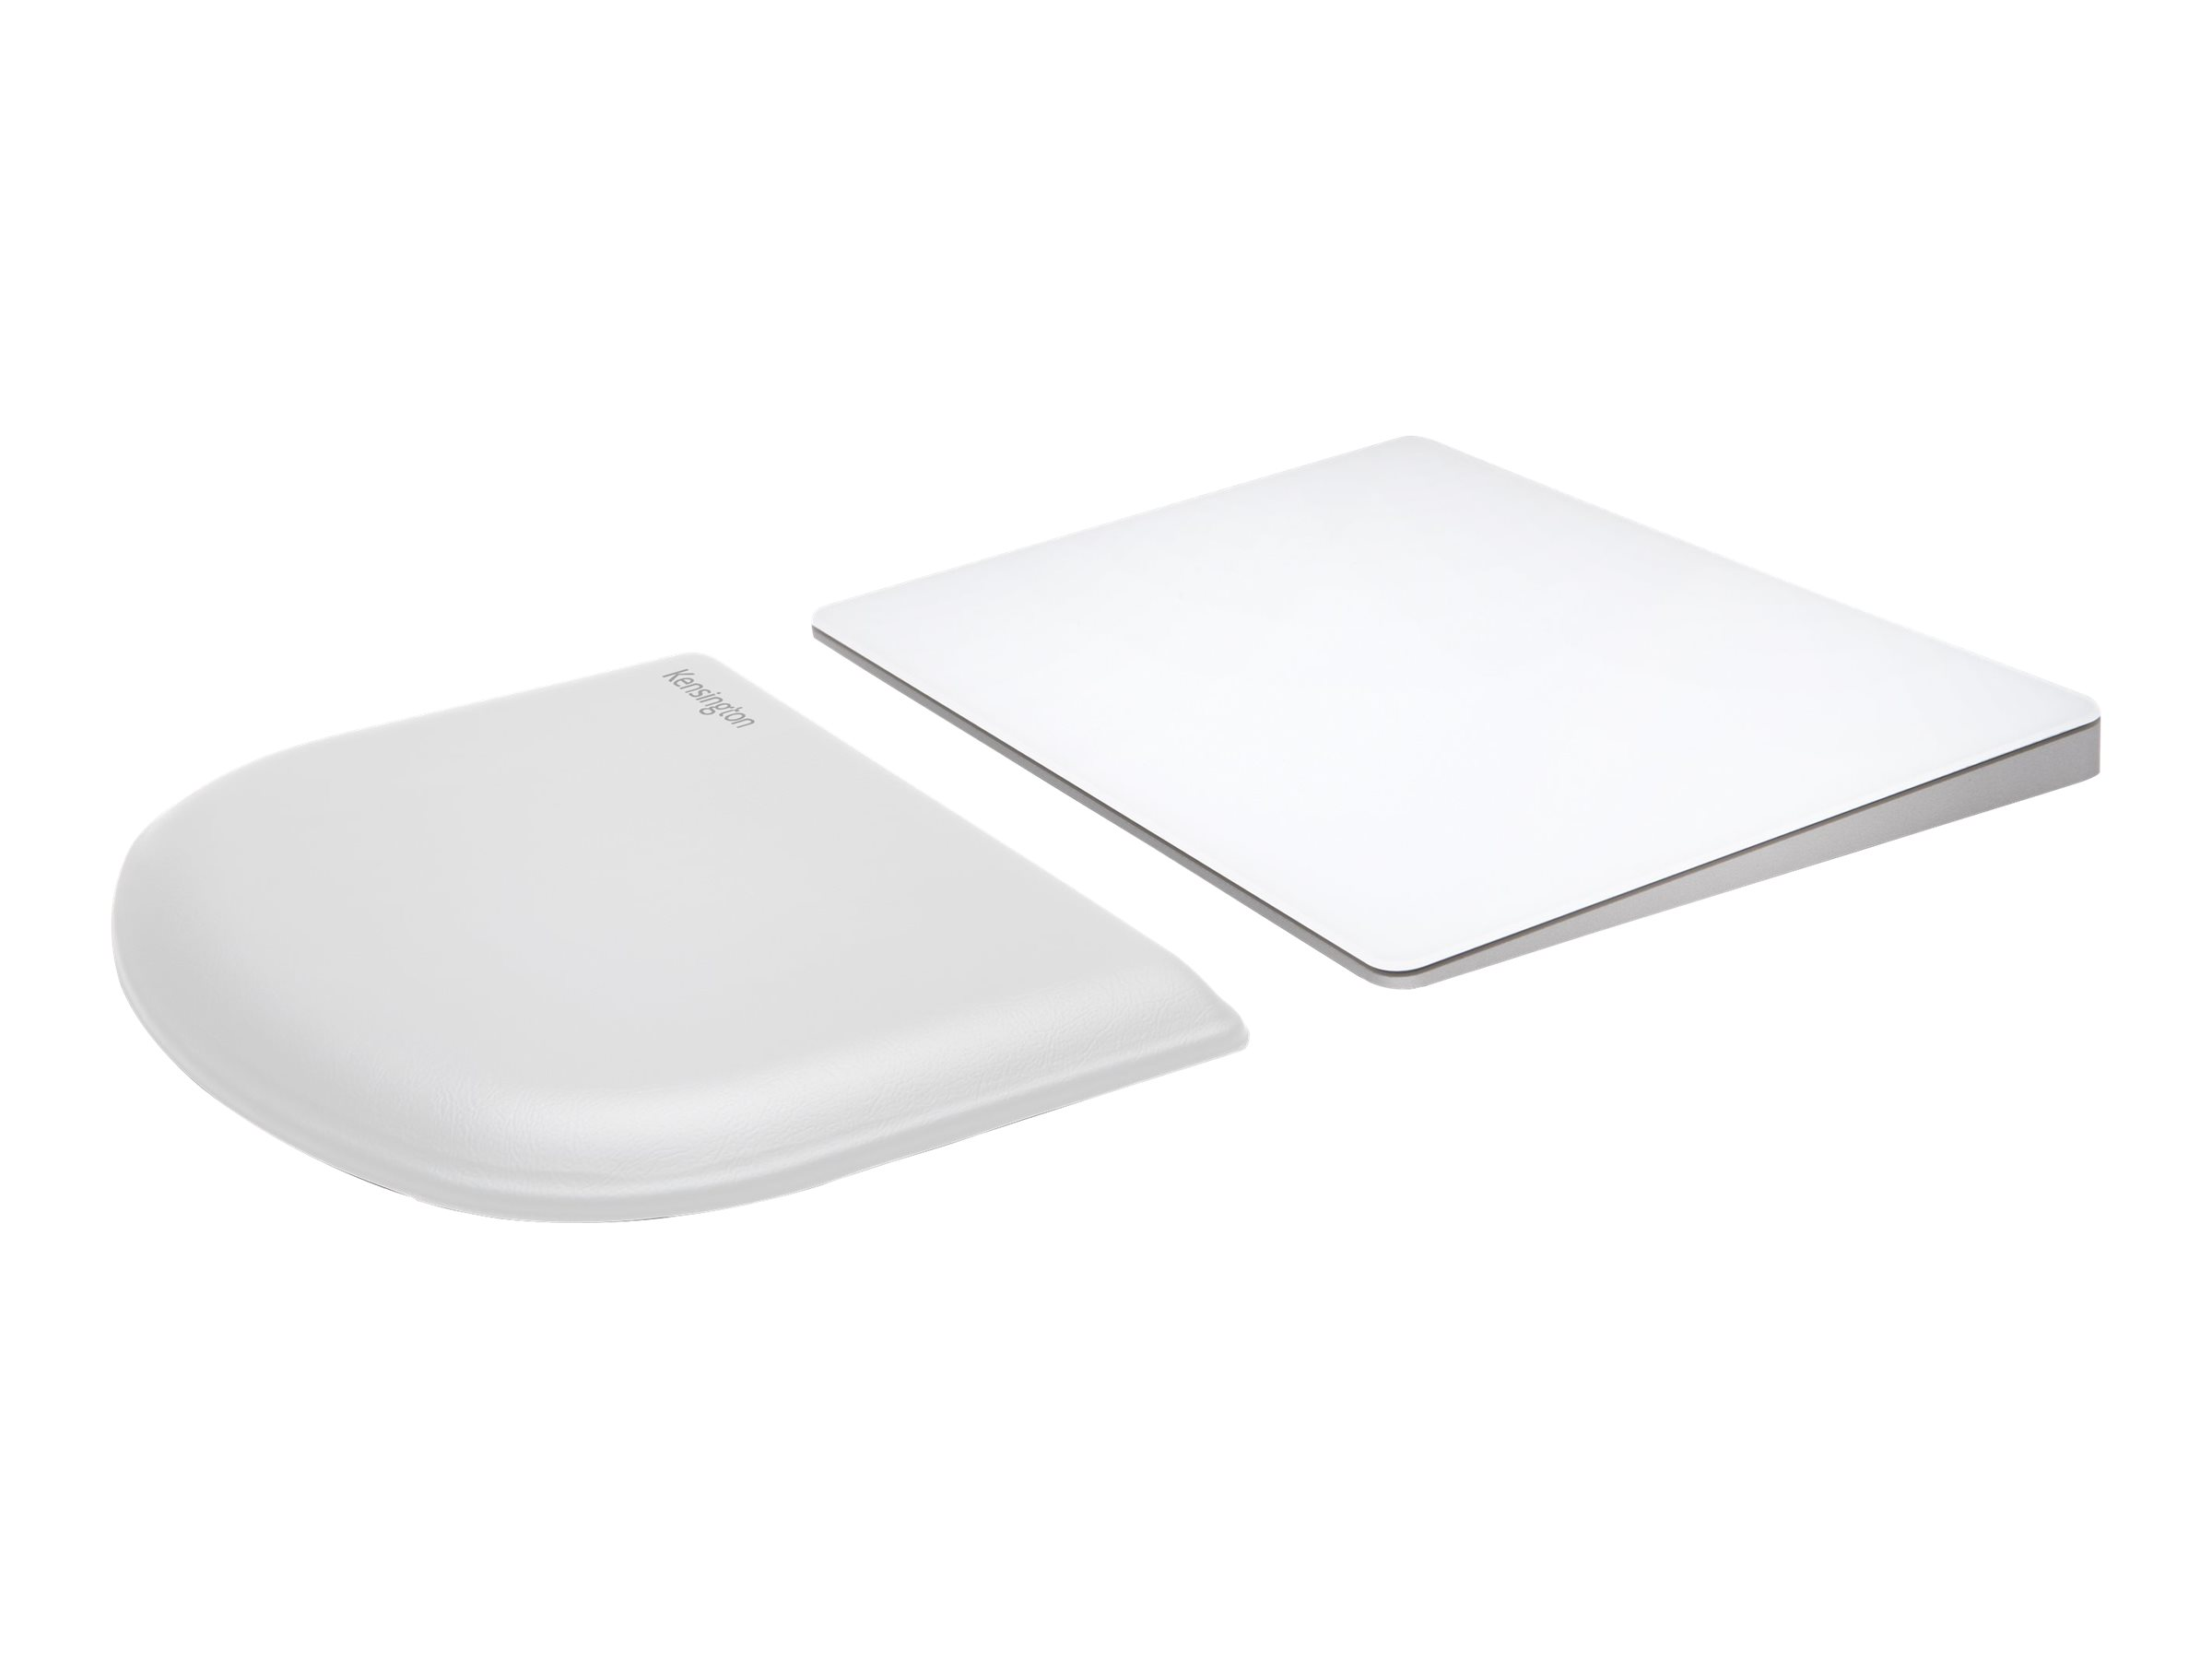 Kensington ErgoSoft - Maus-/Trackpad-Handballenauflage - Grau